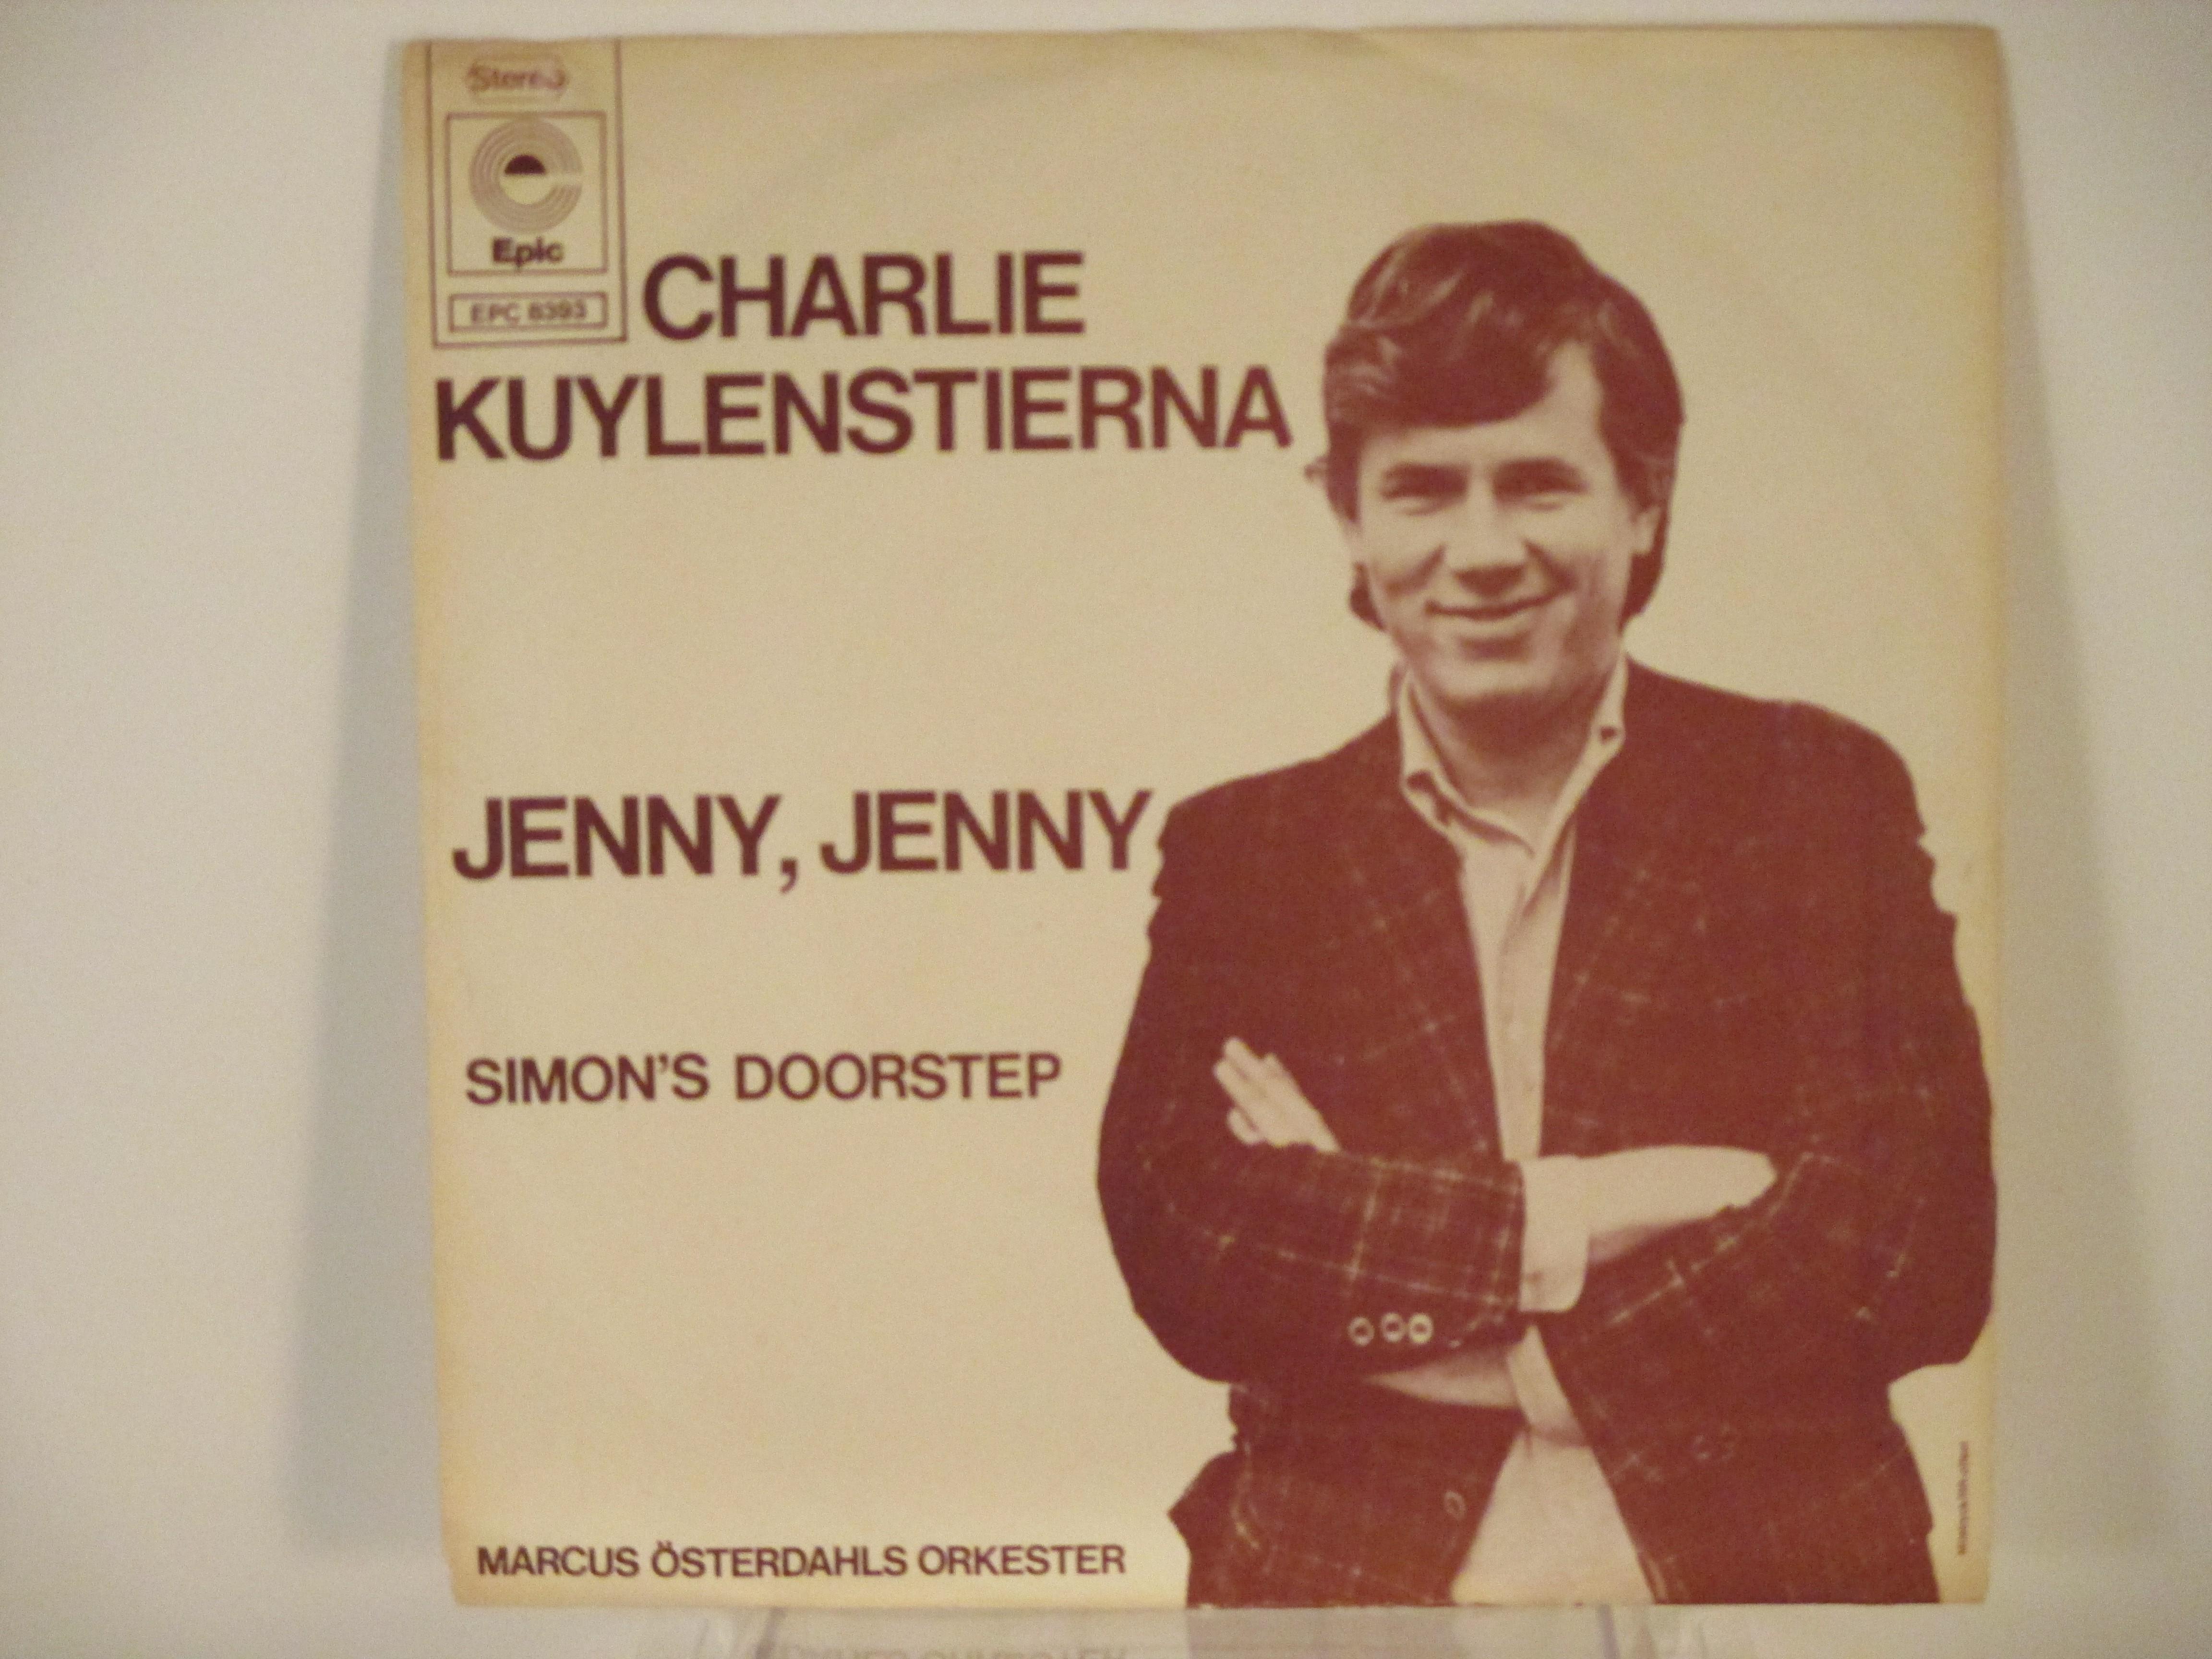 CHARLIE KUYLENSTIERNA : Jenny, Jenny / Simon's doorstep